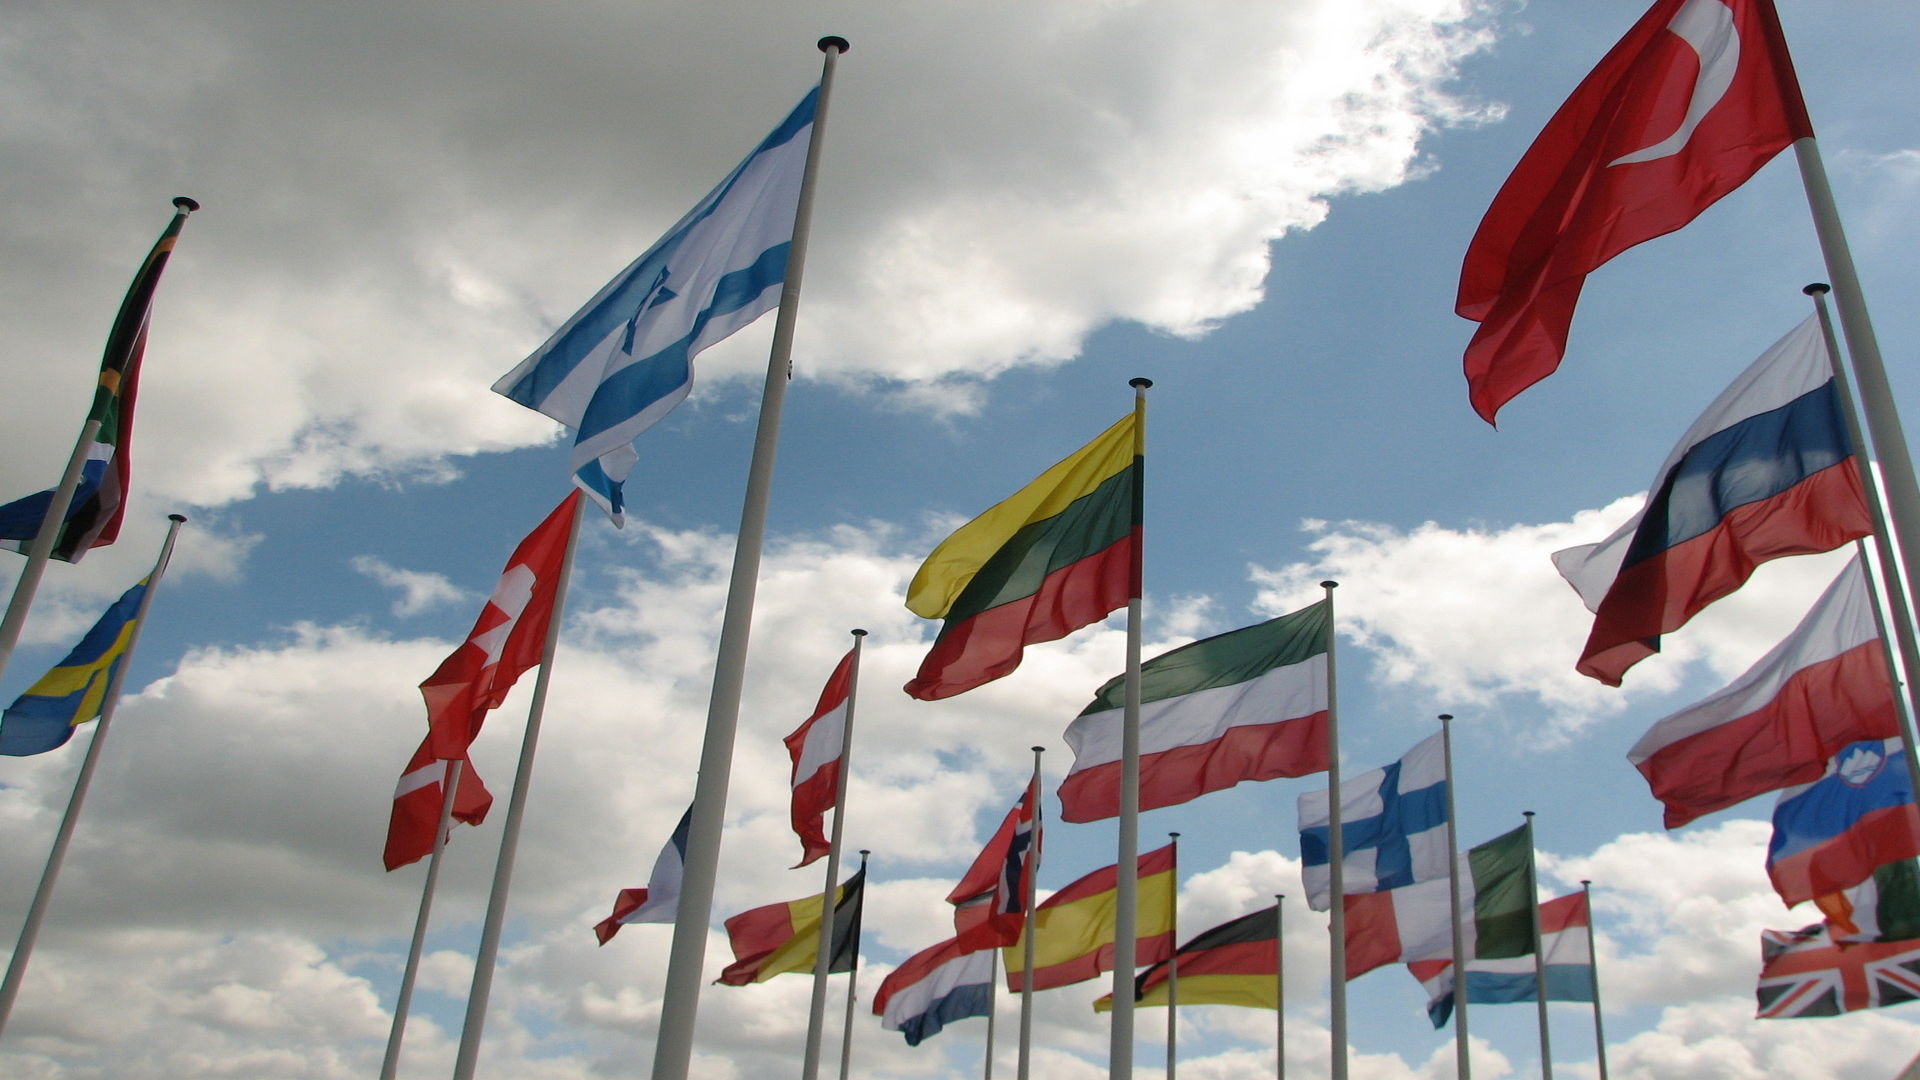 Flags around the world. Photo credit: Tibor Fazakas on Free Images.